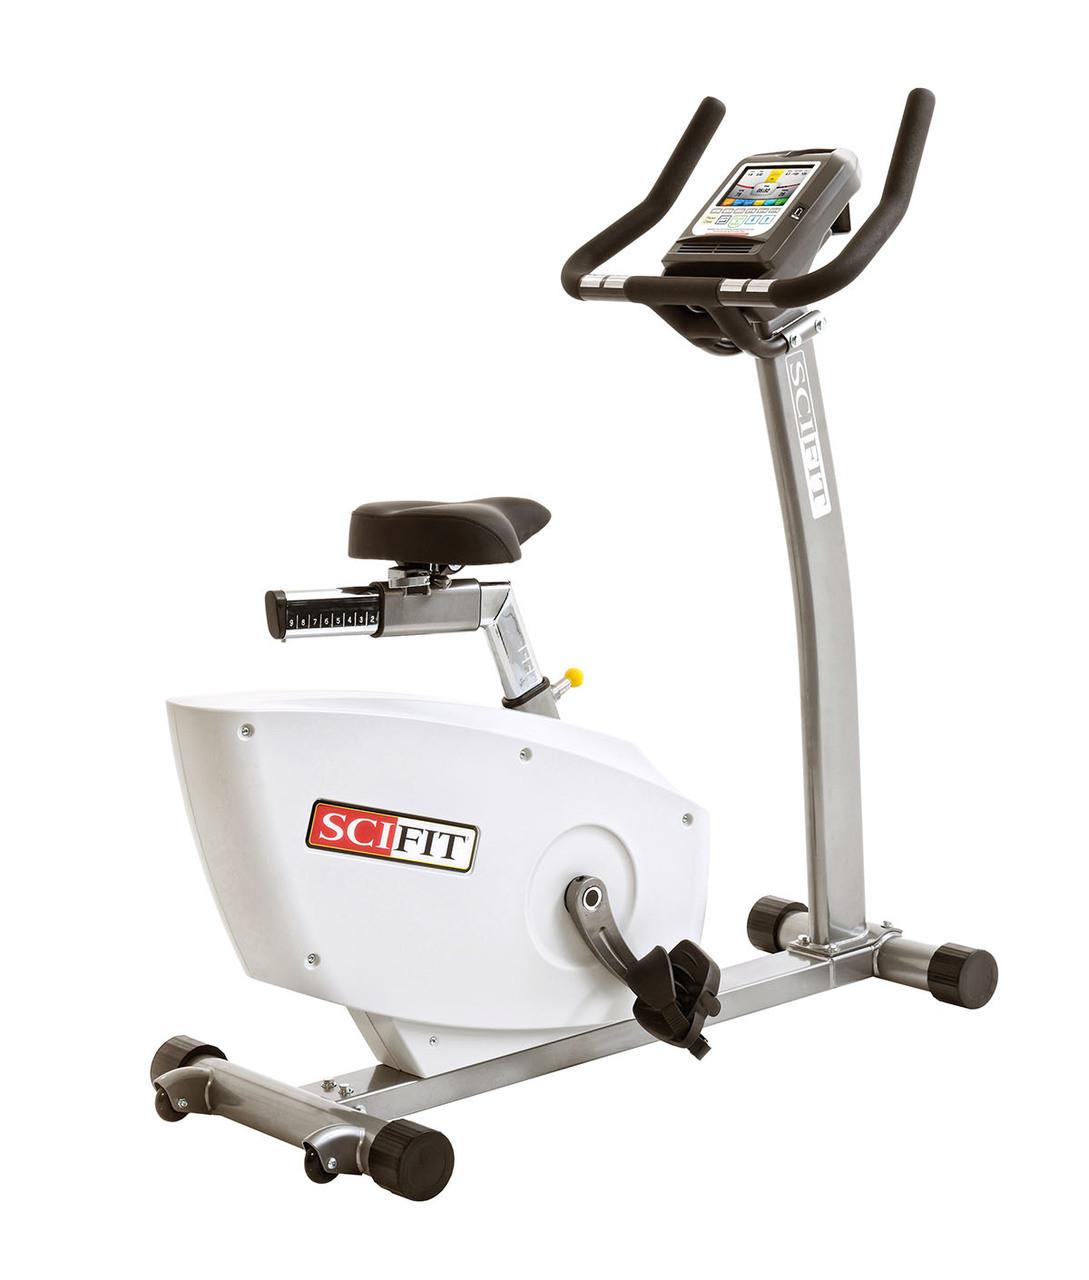 SciFit Upright Bike - Bi-Directional - Step Through